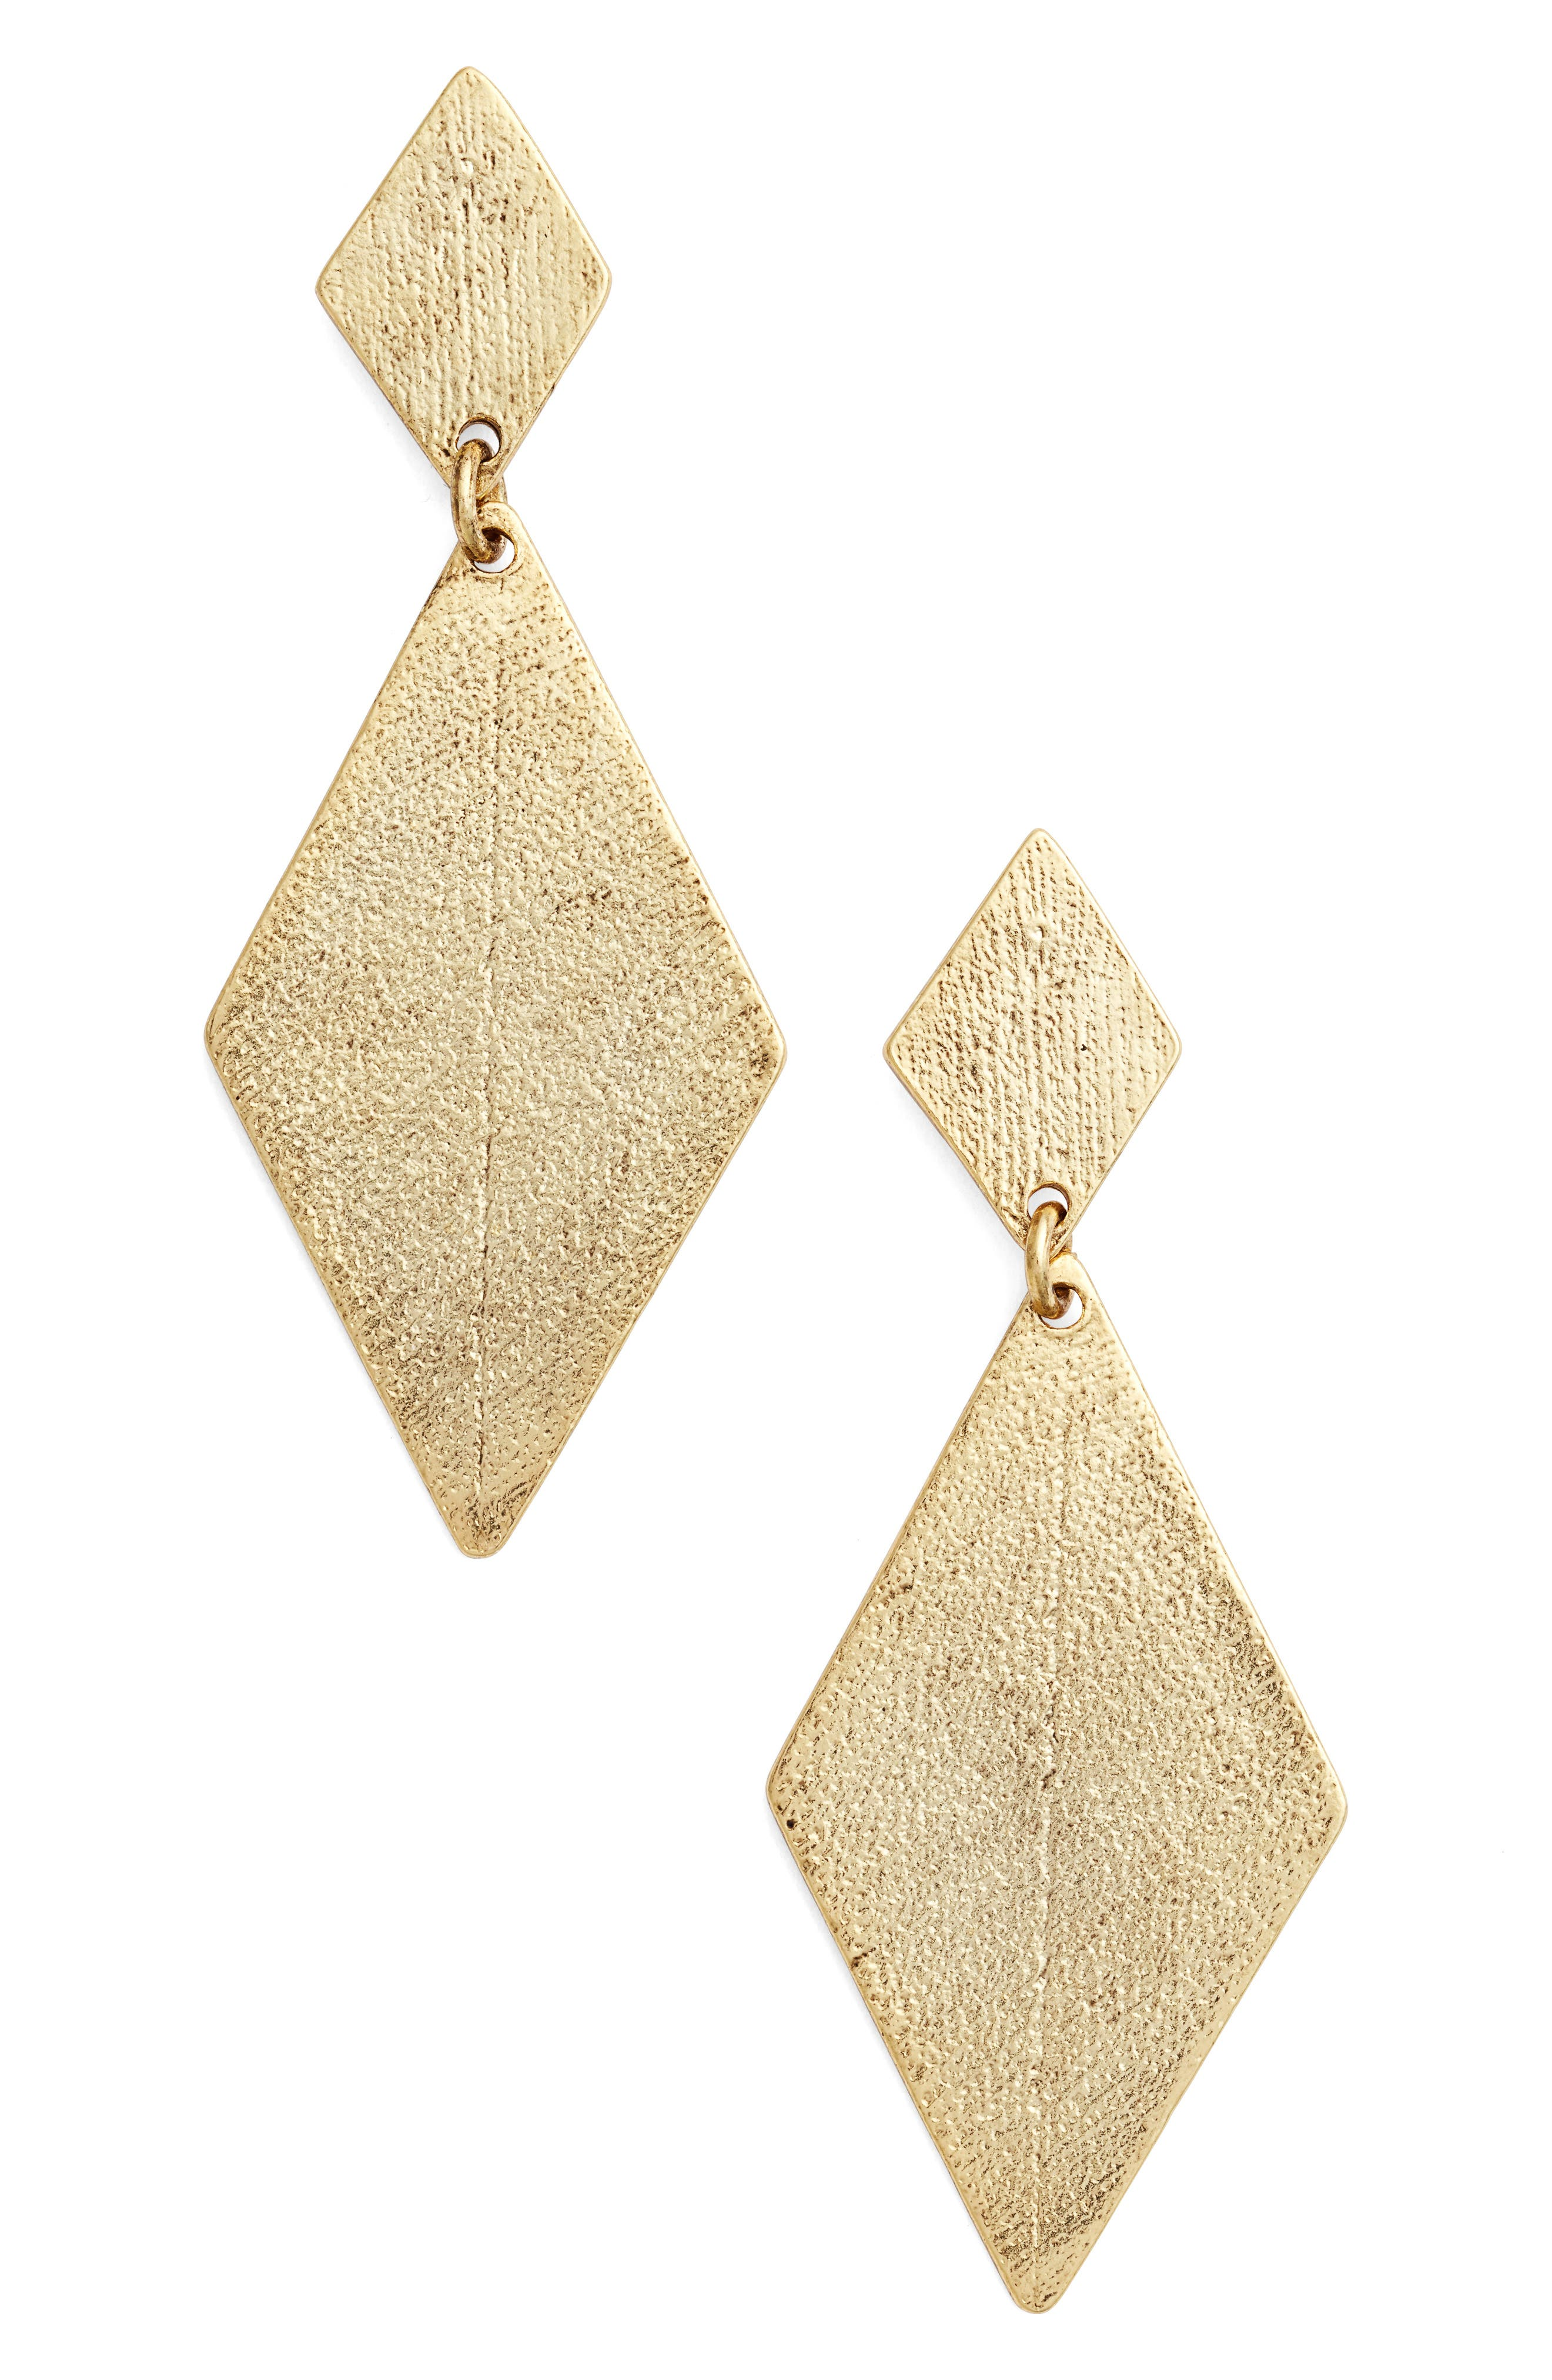 Alternate Image 1 Selected - Karine Sultan Kite Earrings